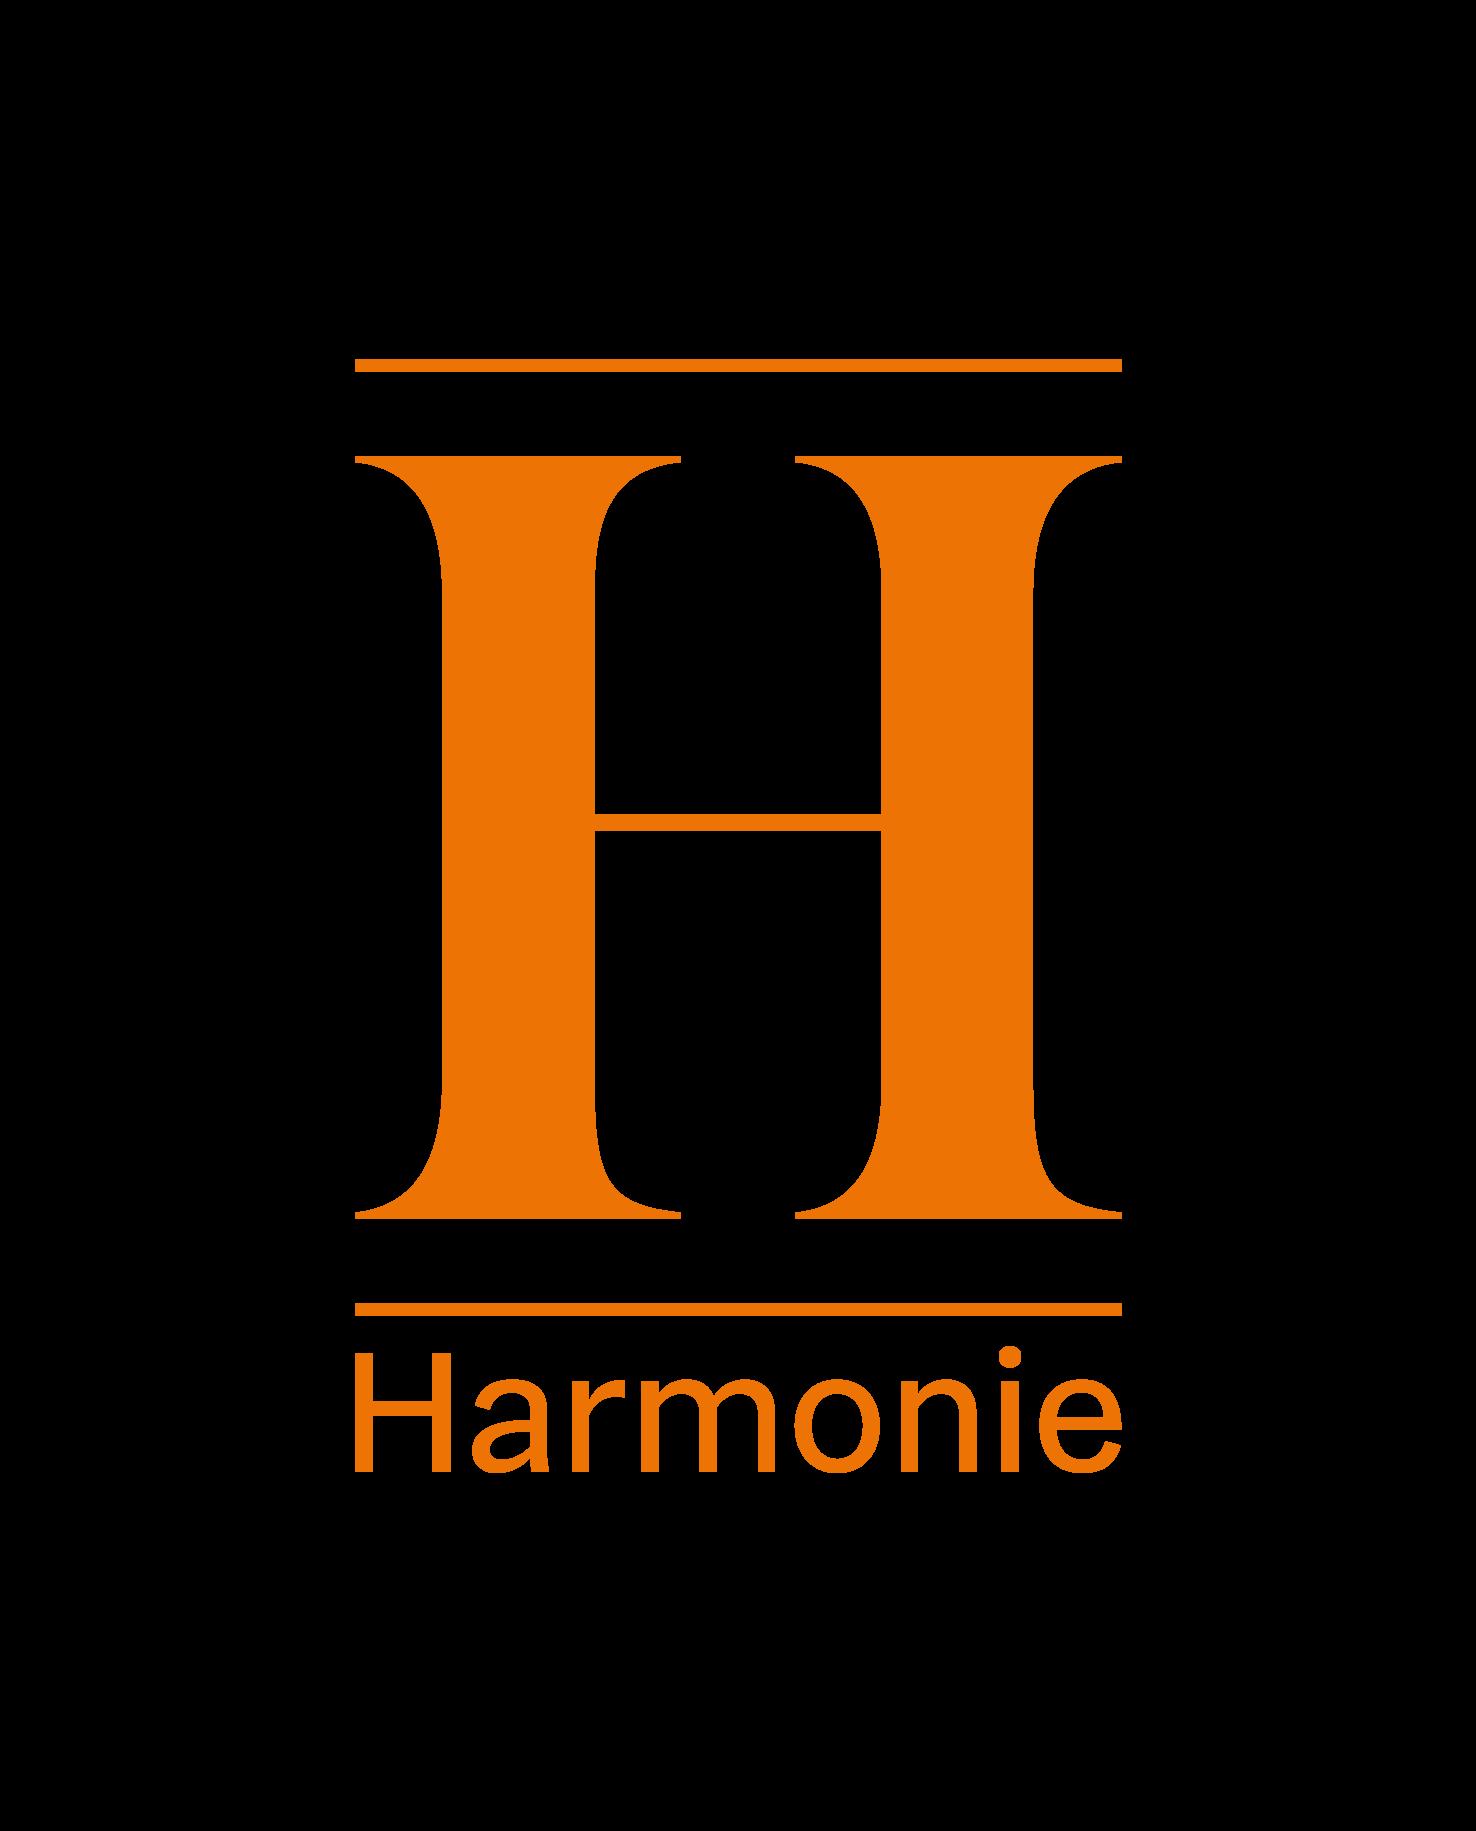 Harmonie_LOGO_ORANGE-01